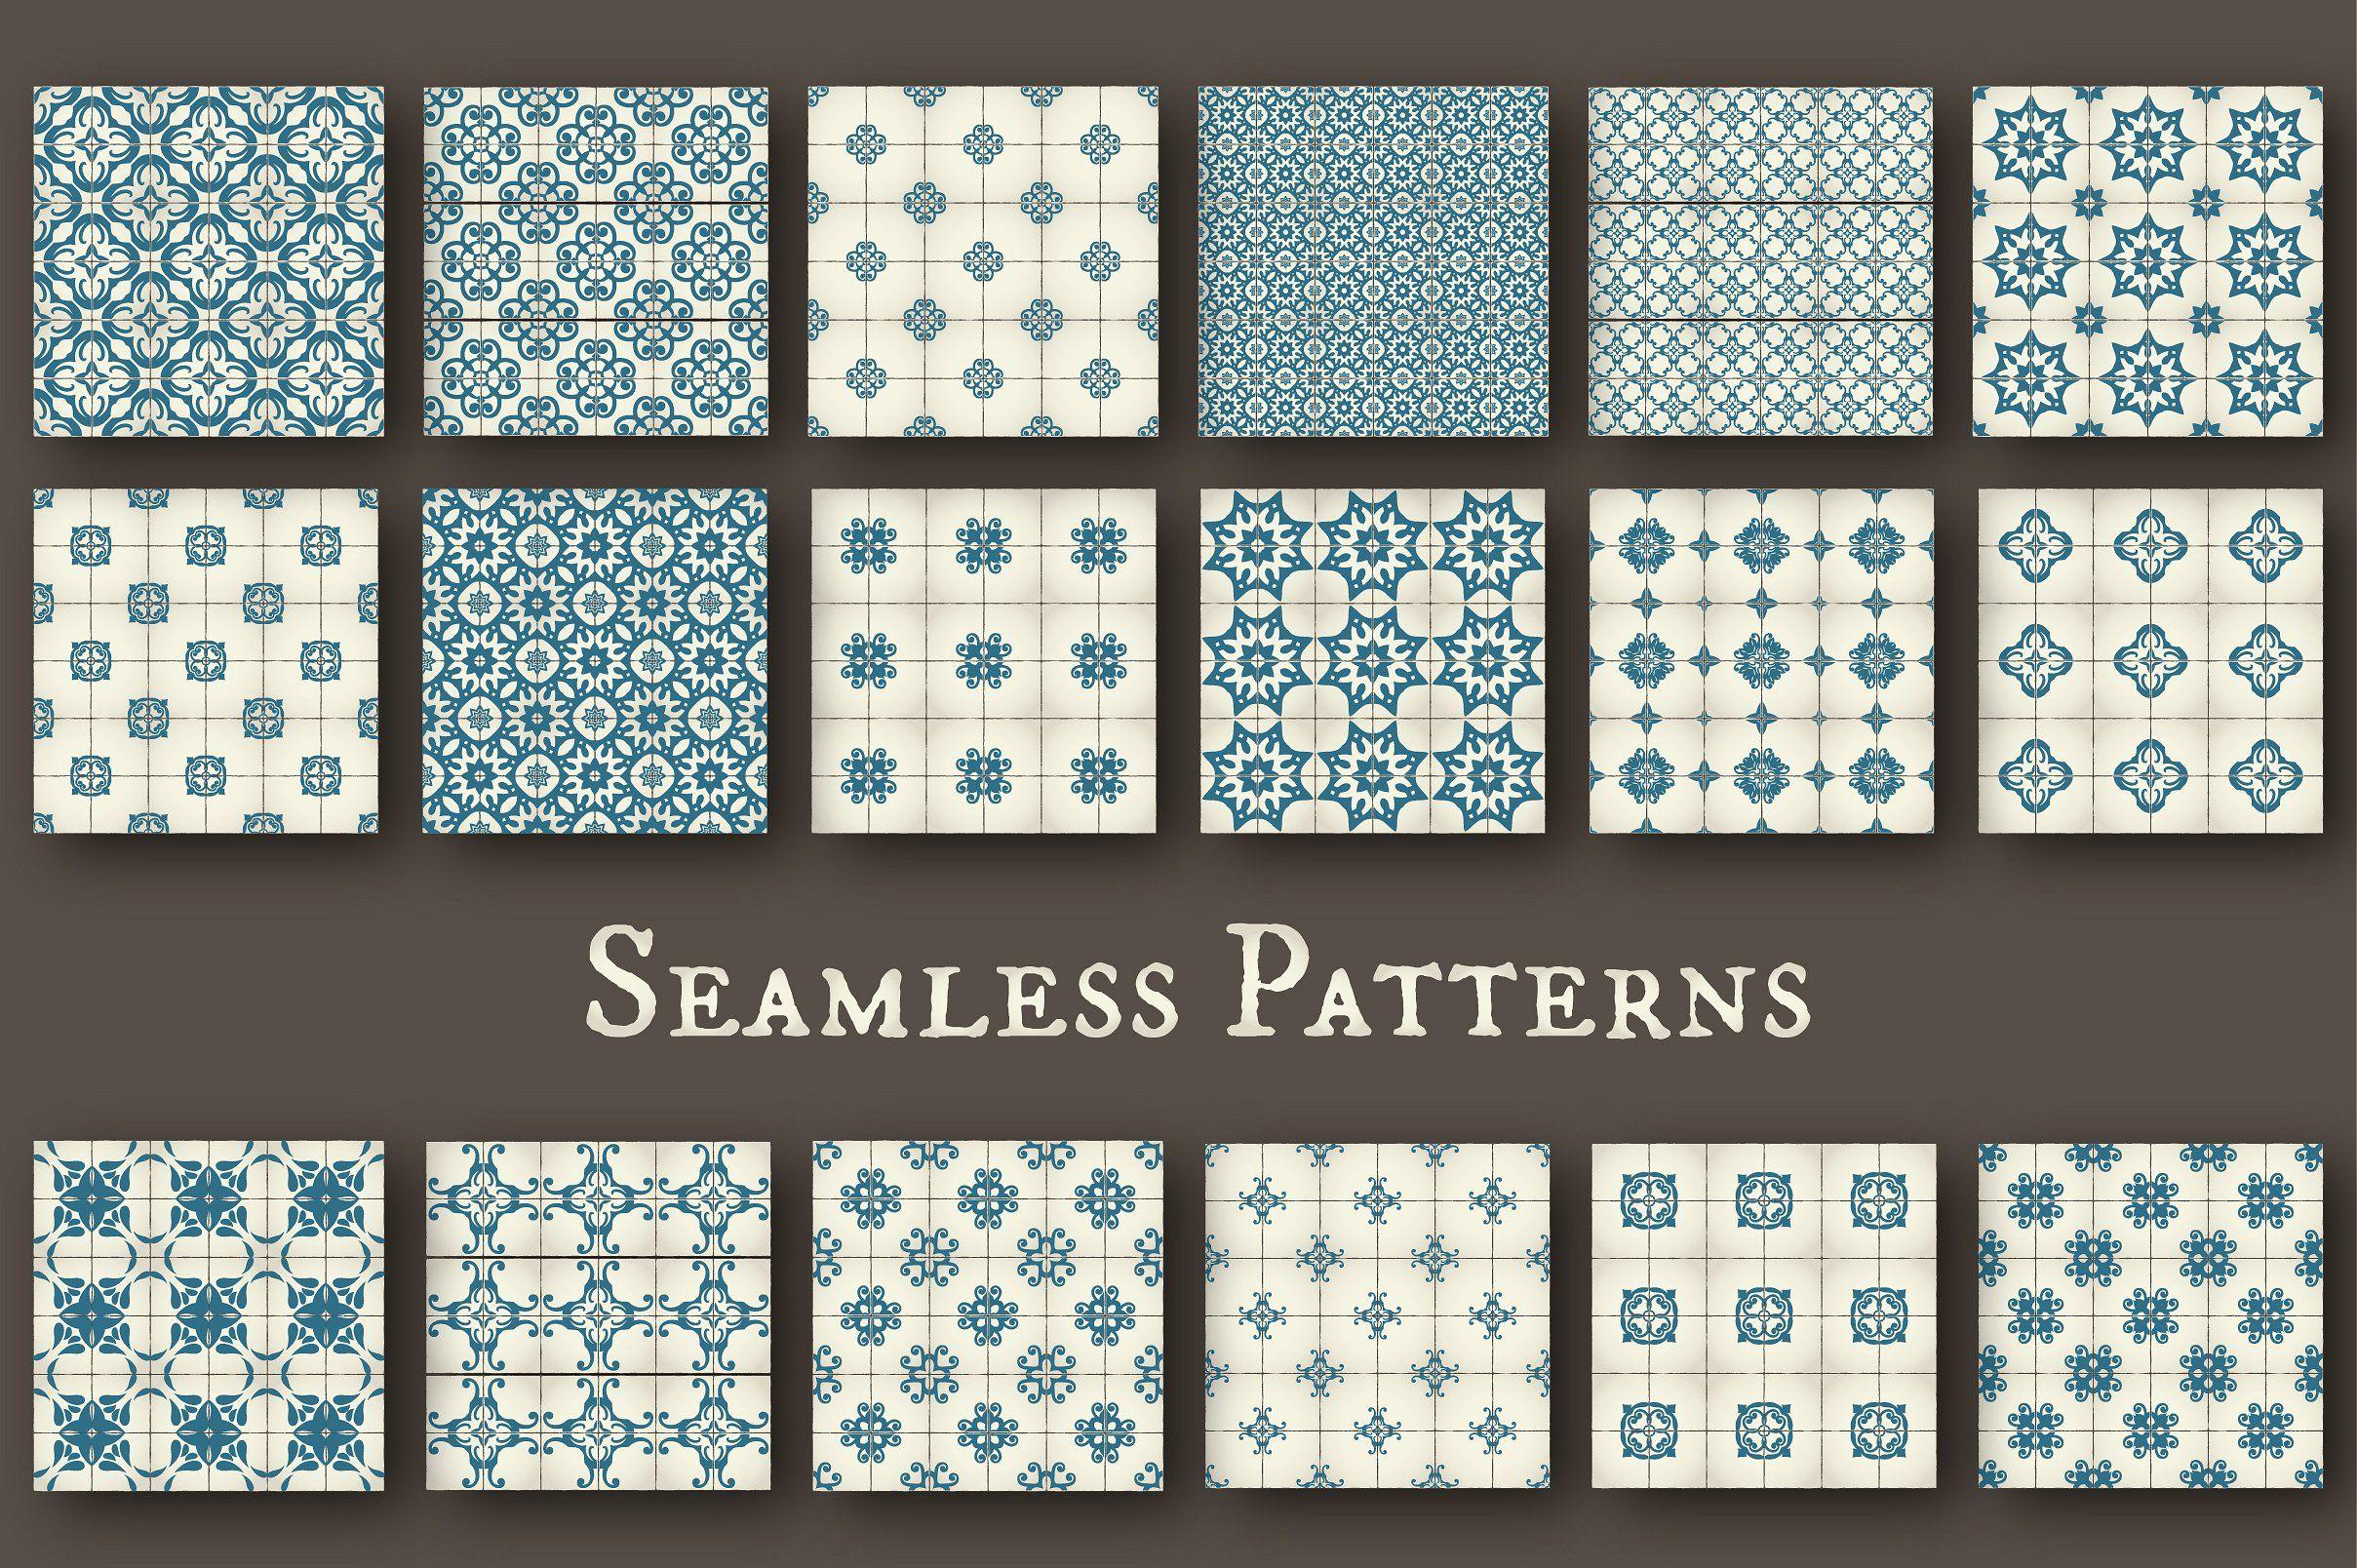 Tile Templates & Seamless Patterns Seamless patterns